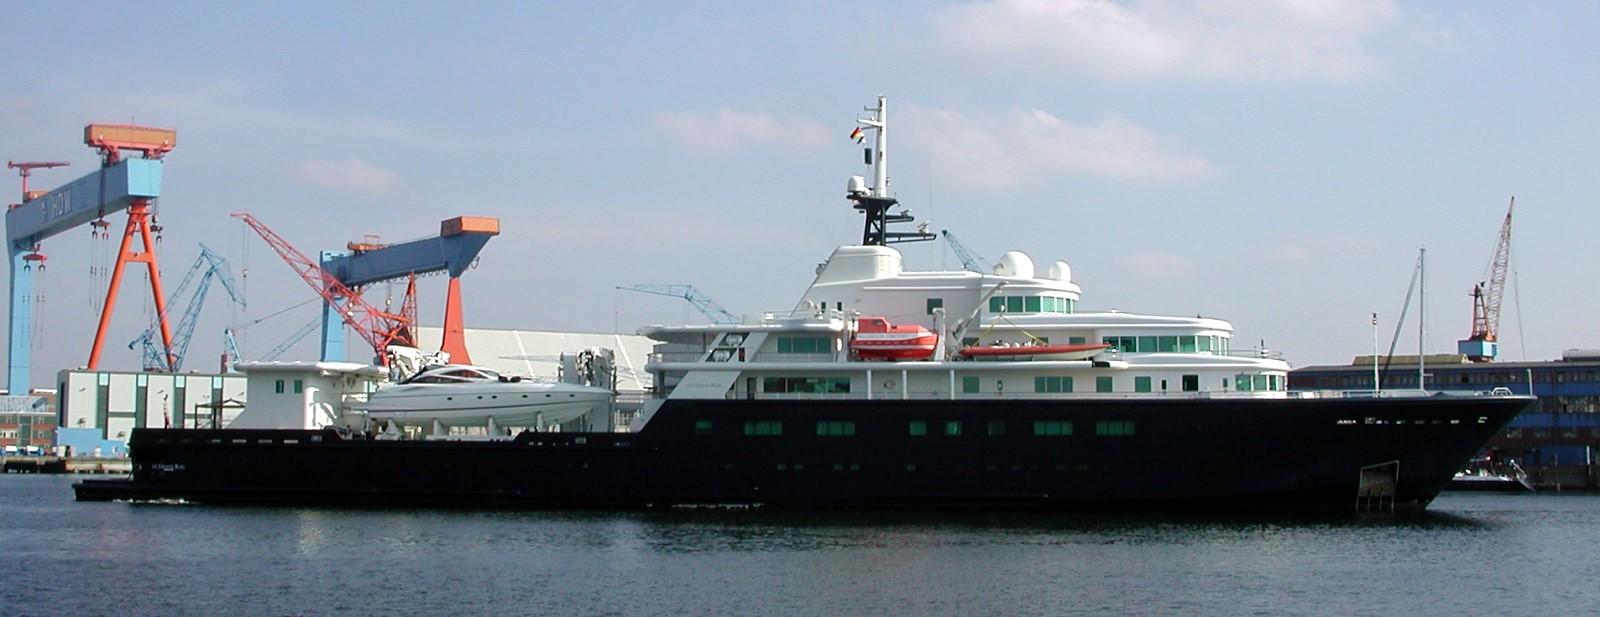 File Yacht Le Grand Bleu Wikimedia Commons